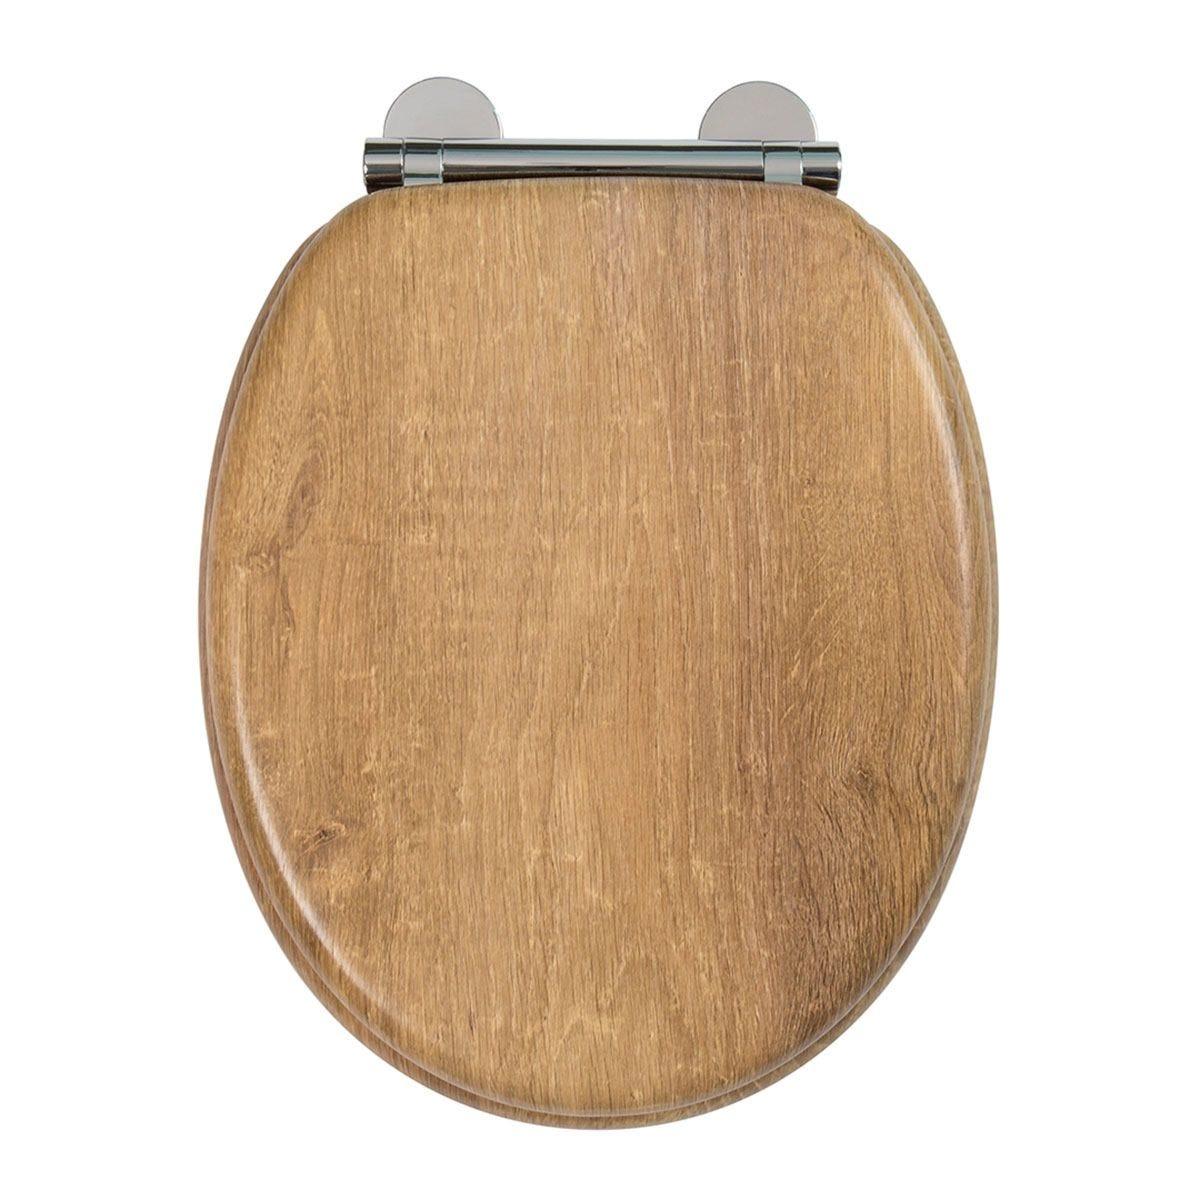 Croydex Flexi Fix Ontario Toilet Seat with Soft Close